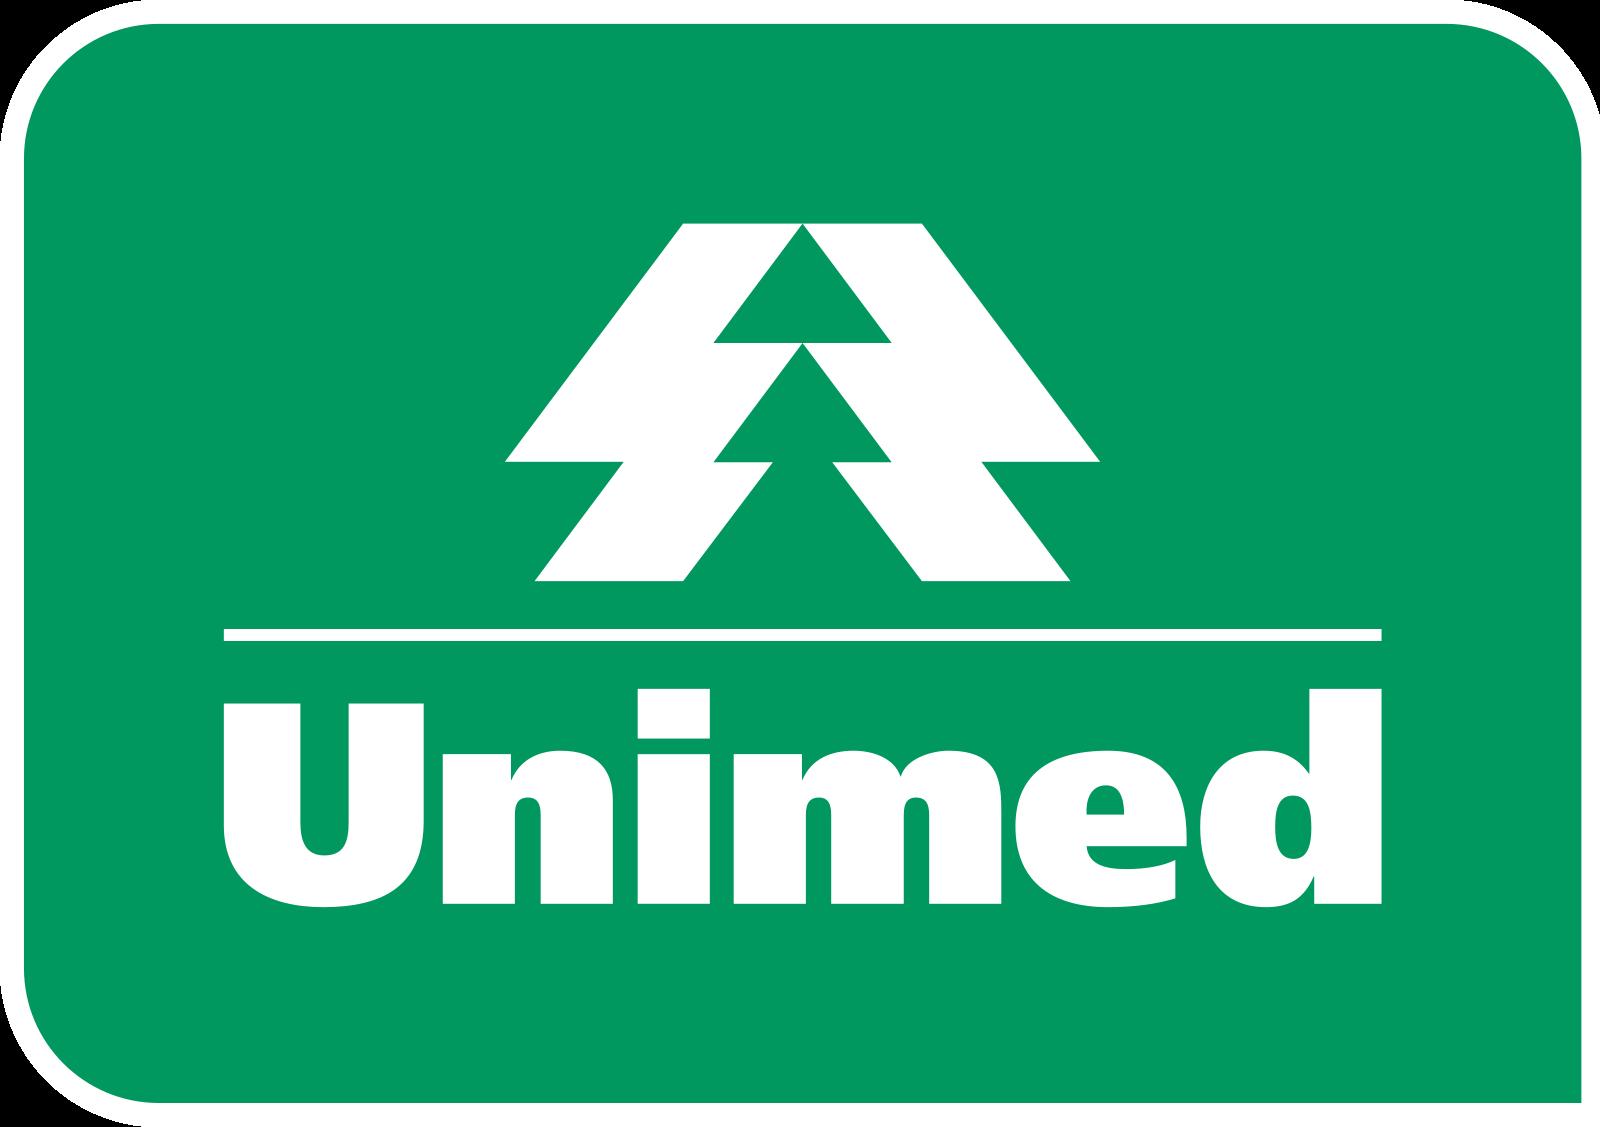 unimed logo 5 1 - Unimed Logo